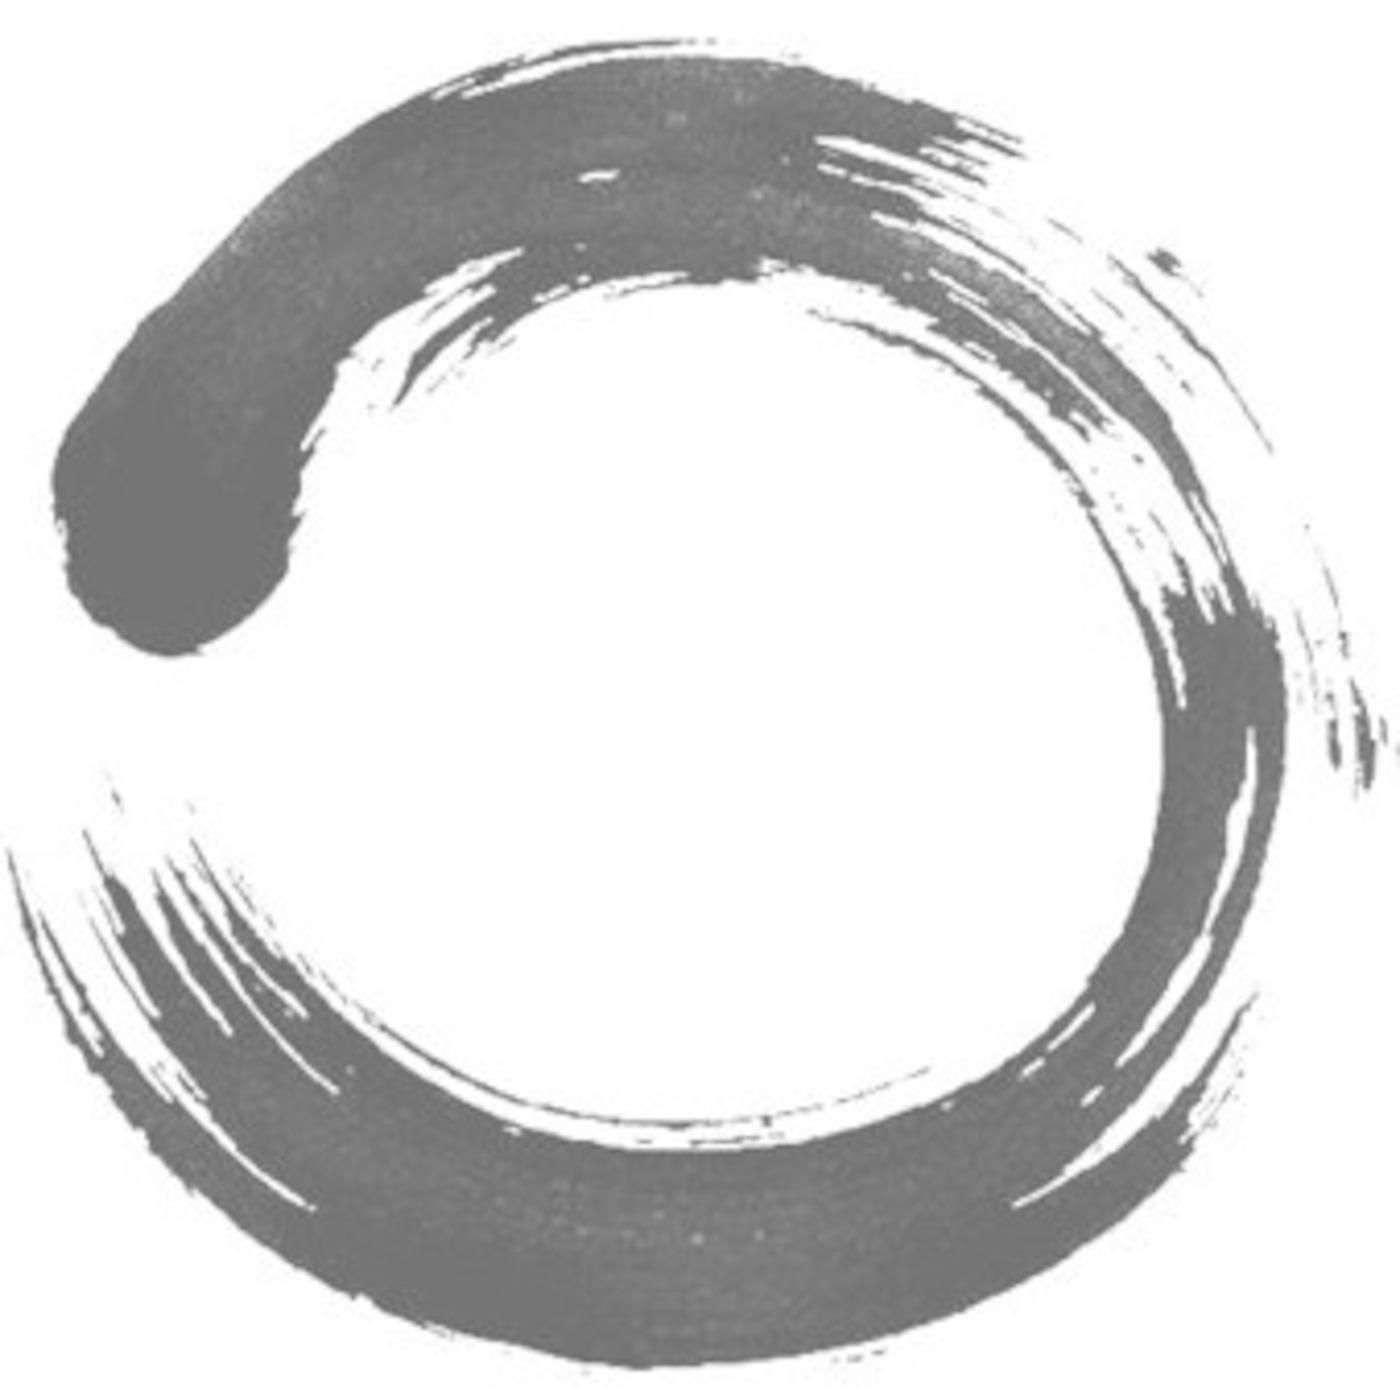 Fattore Zen Poadcast